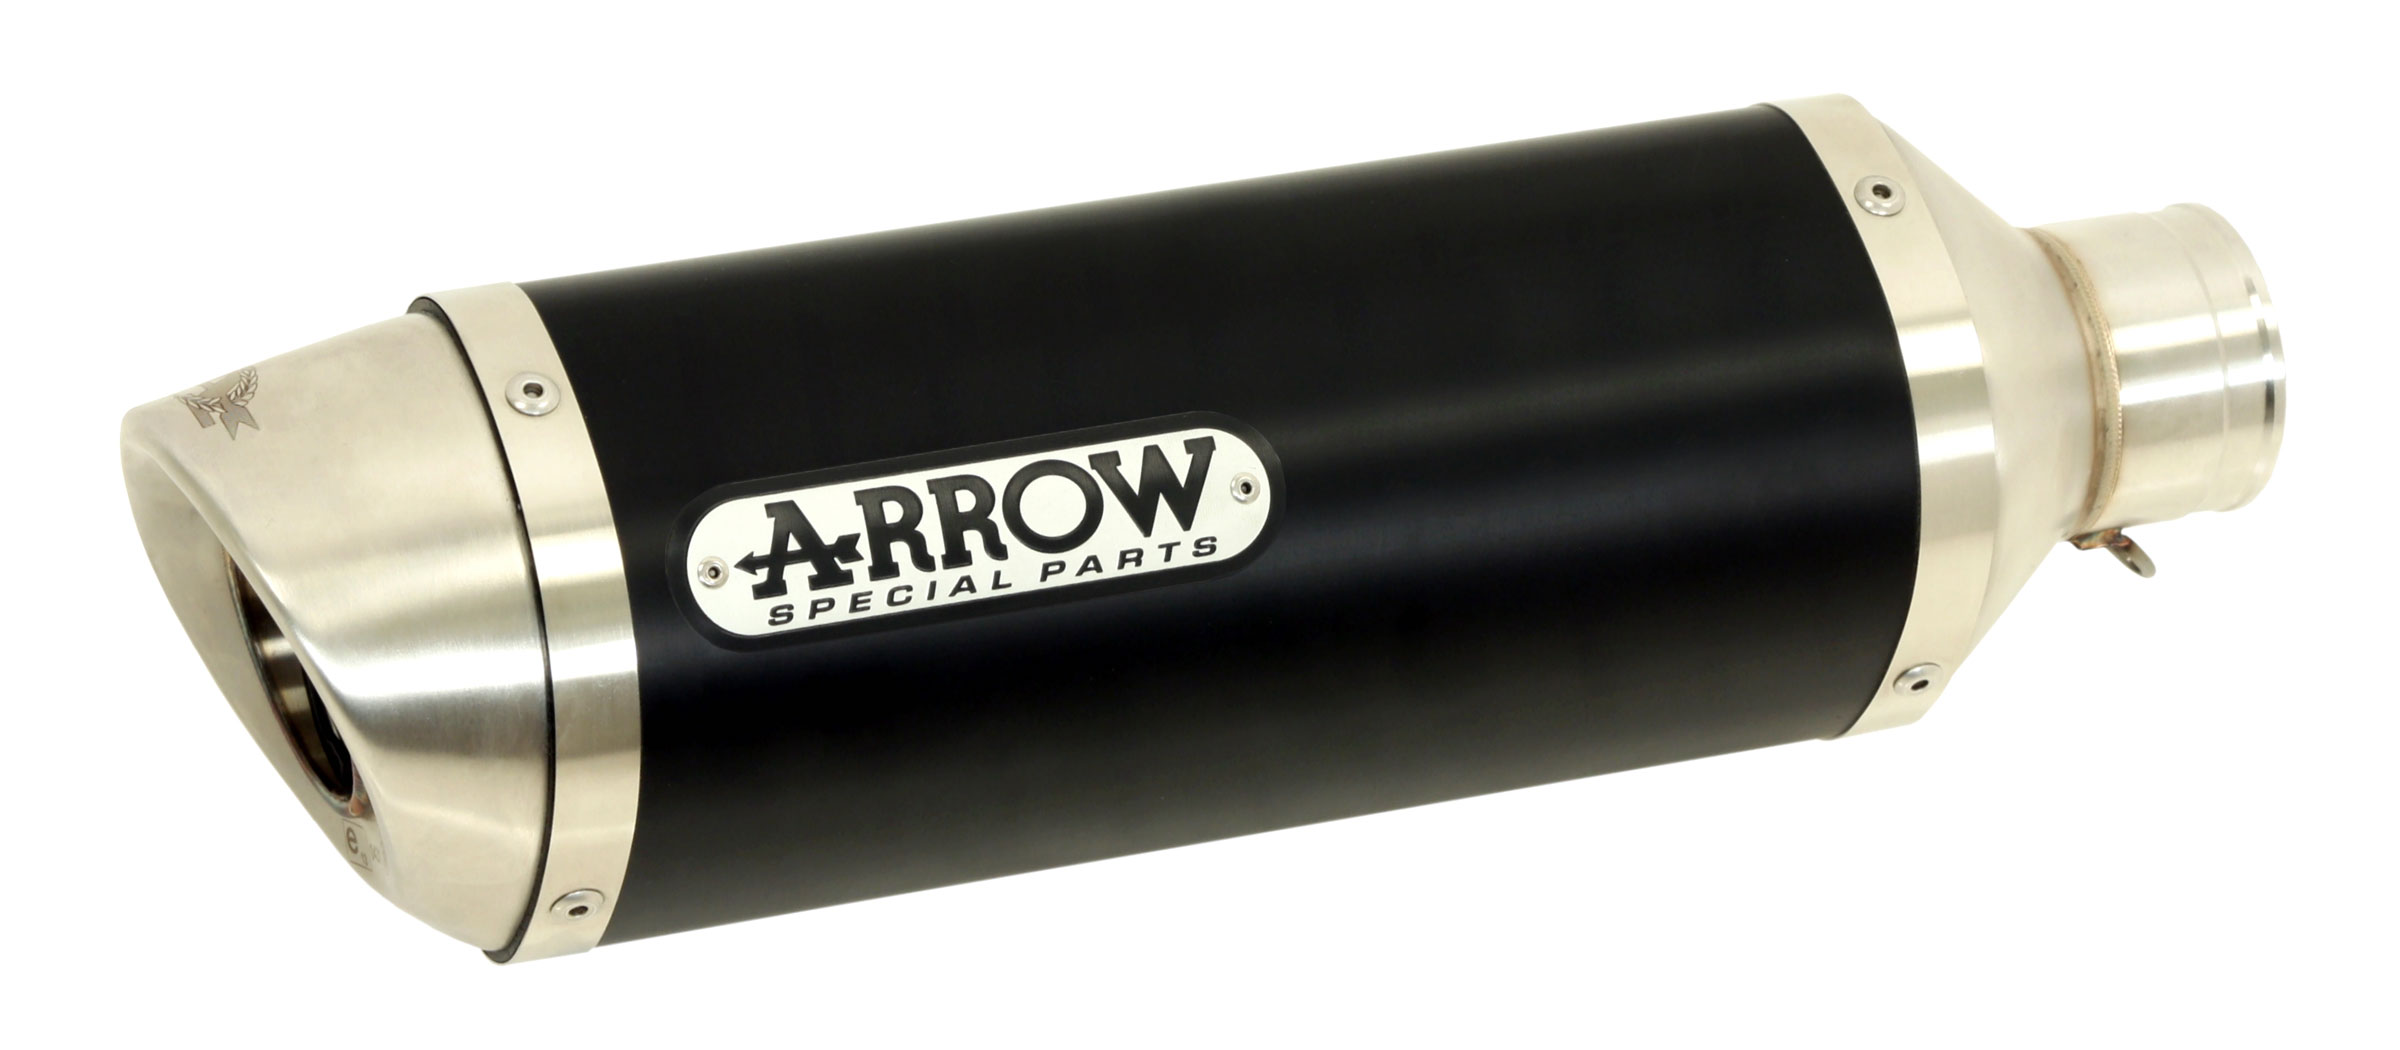 ARROW Auspuff RACE TECH für Kawasaki Z1000 2014- aus Aluminium, schwarz